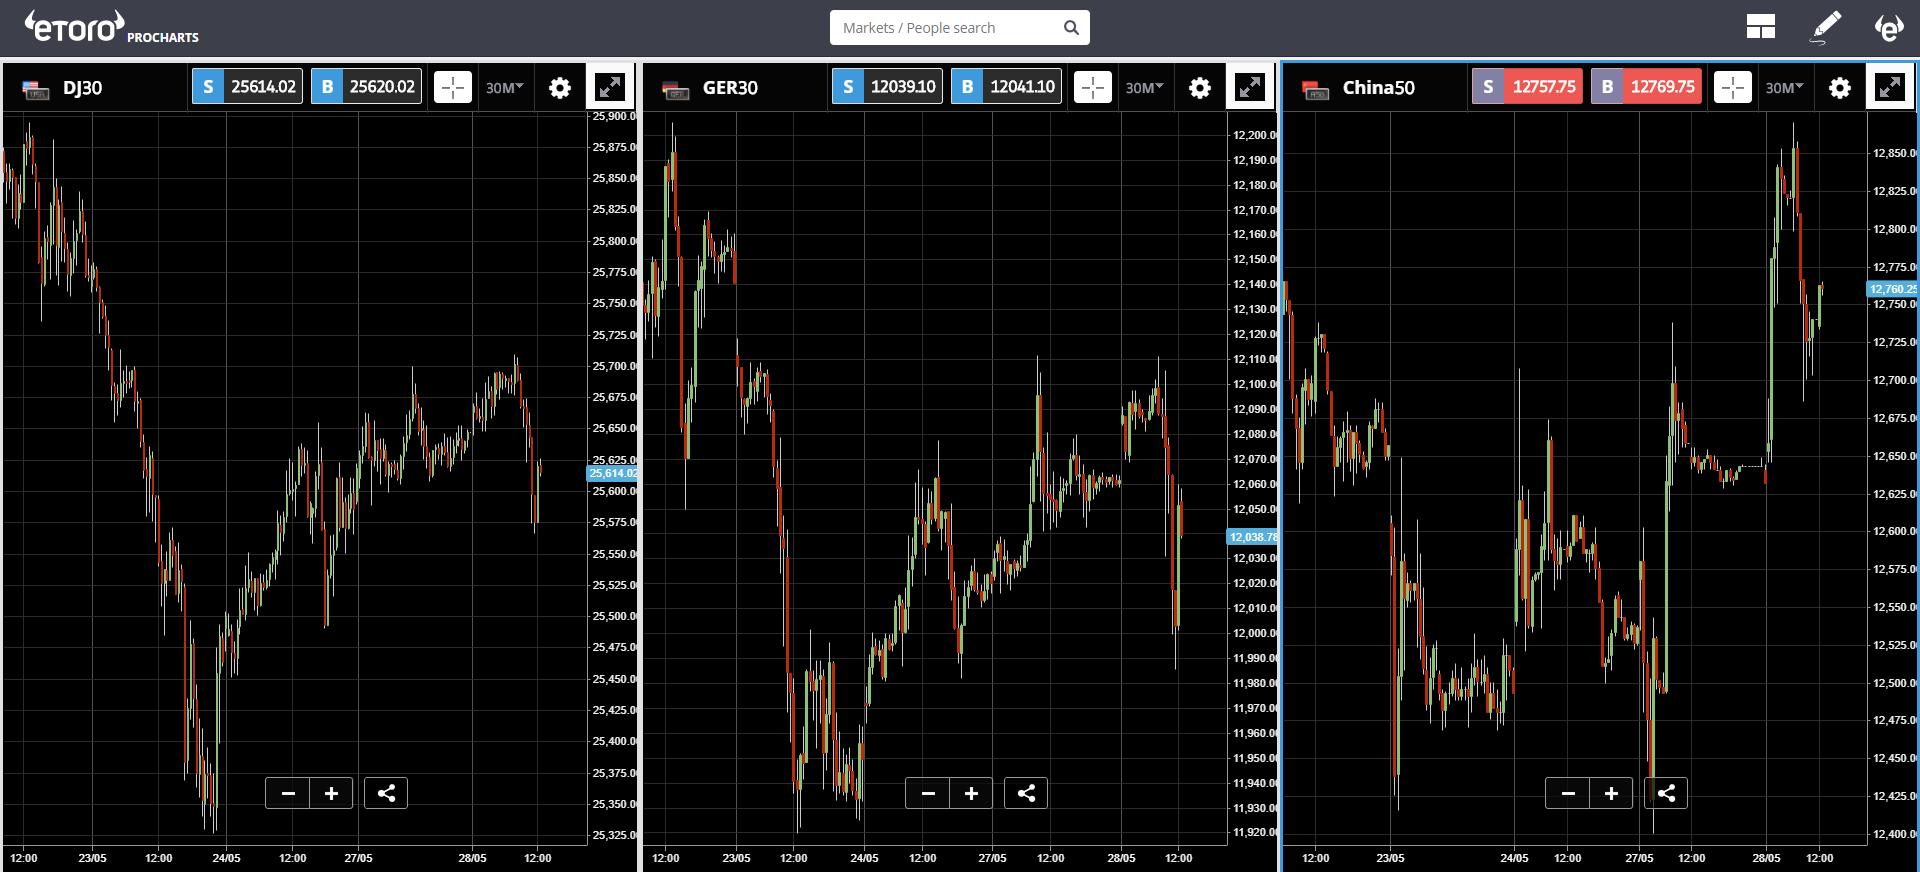 bitcoin, cryptocurrency, market, blockchain, ethereum, trading, stocks,